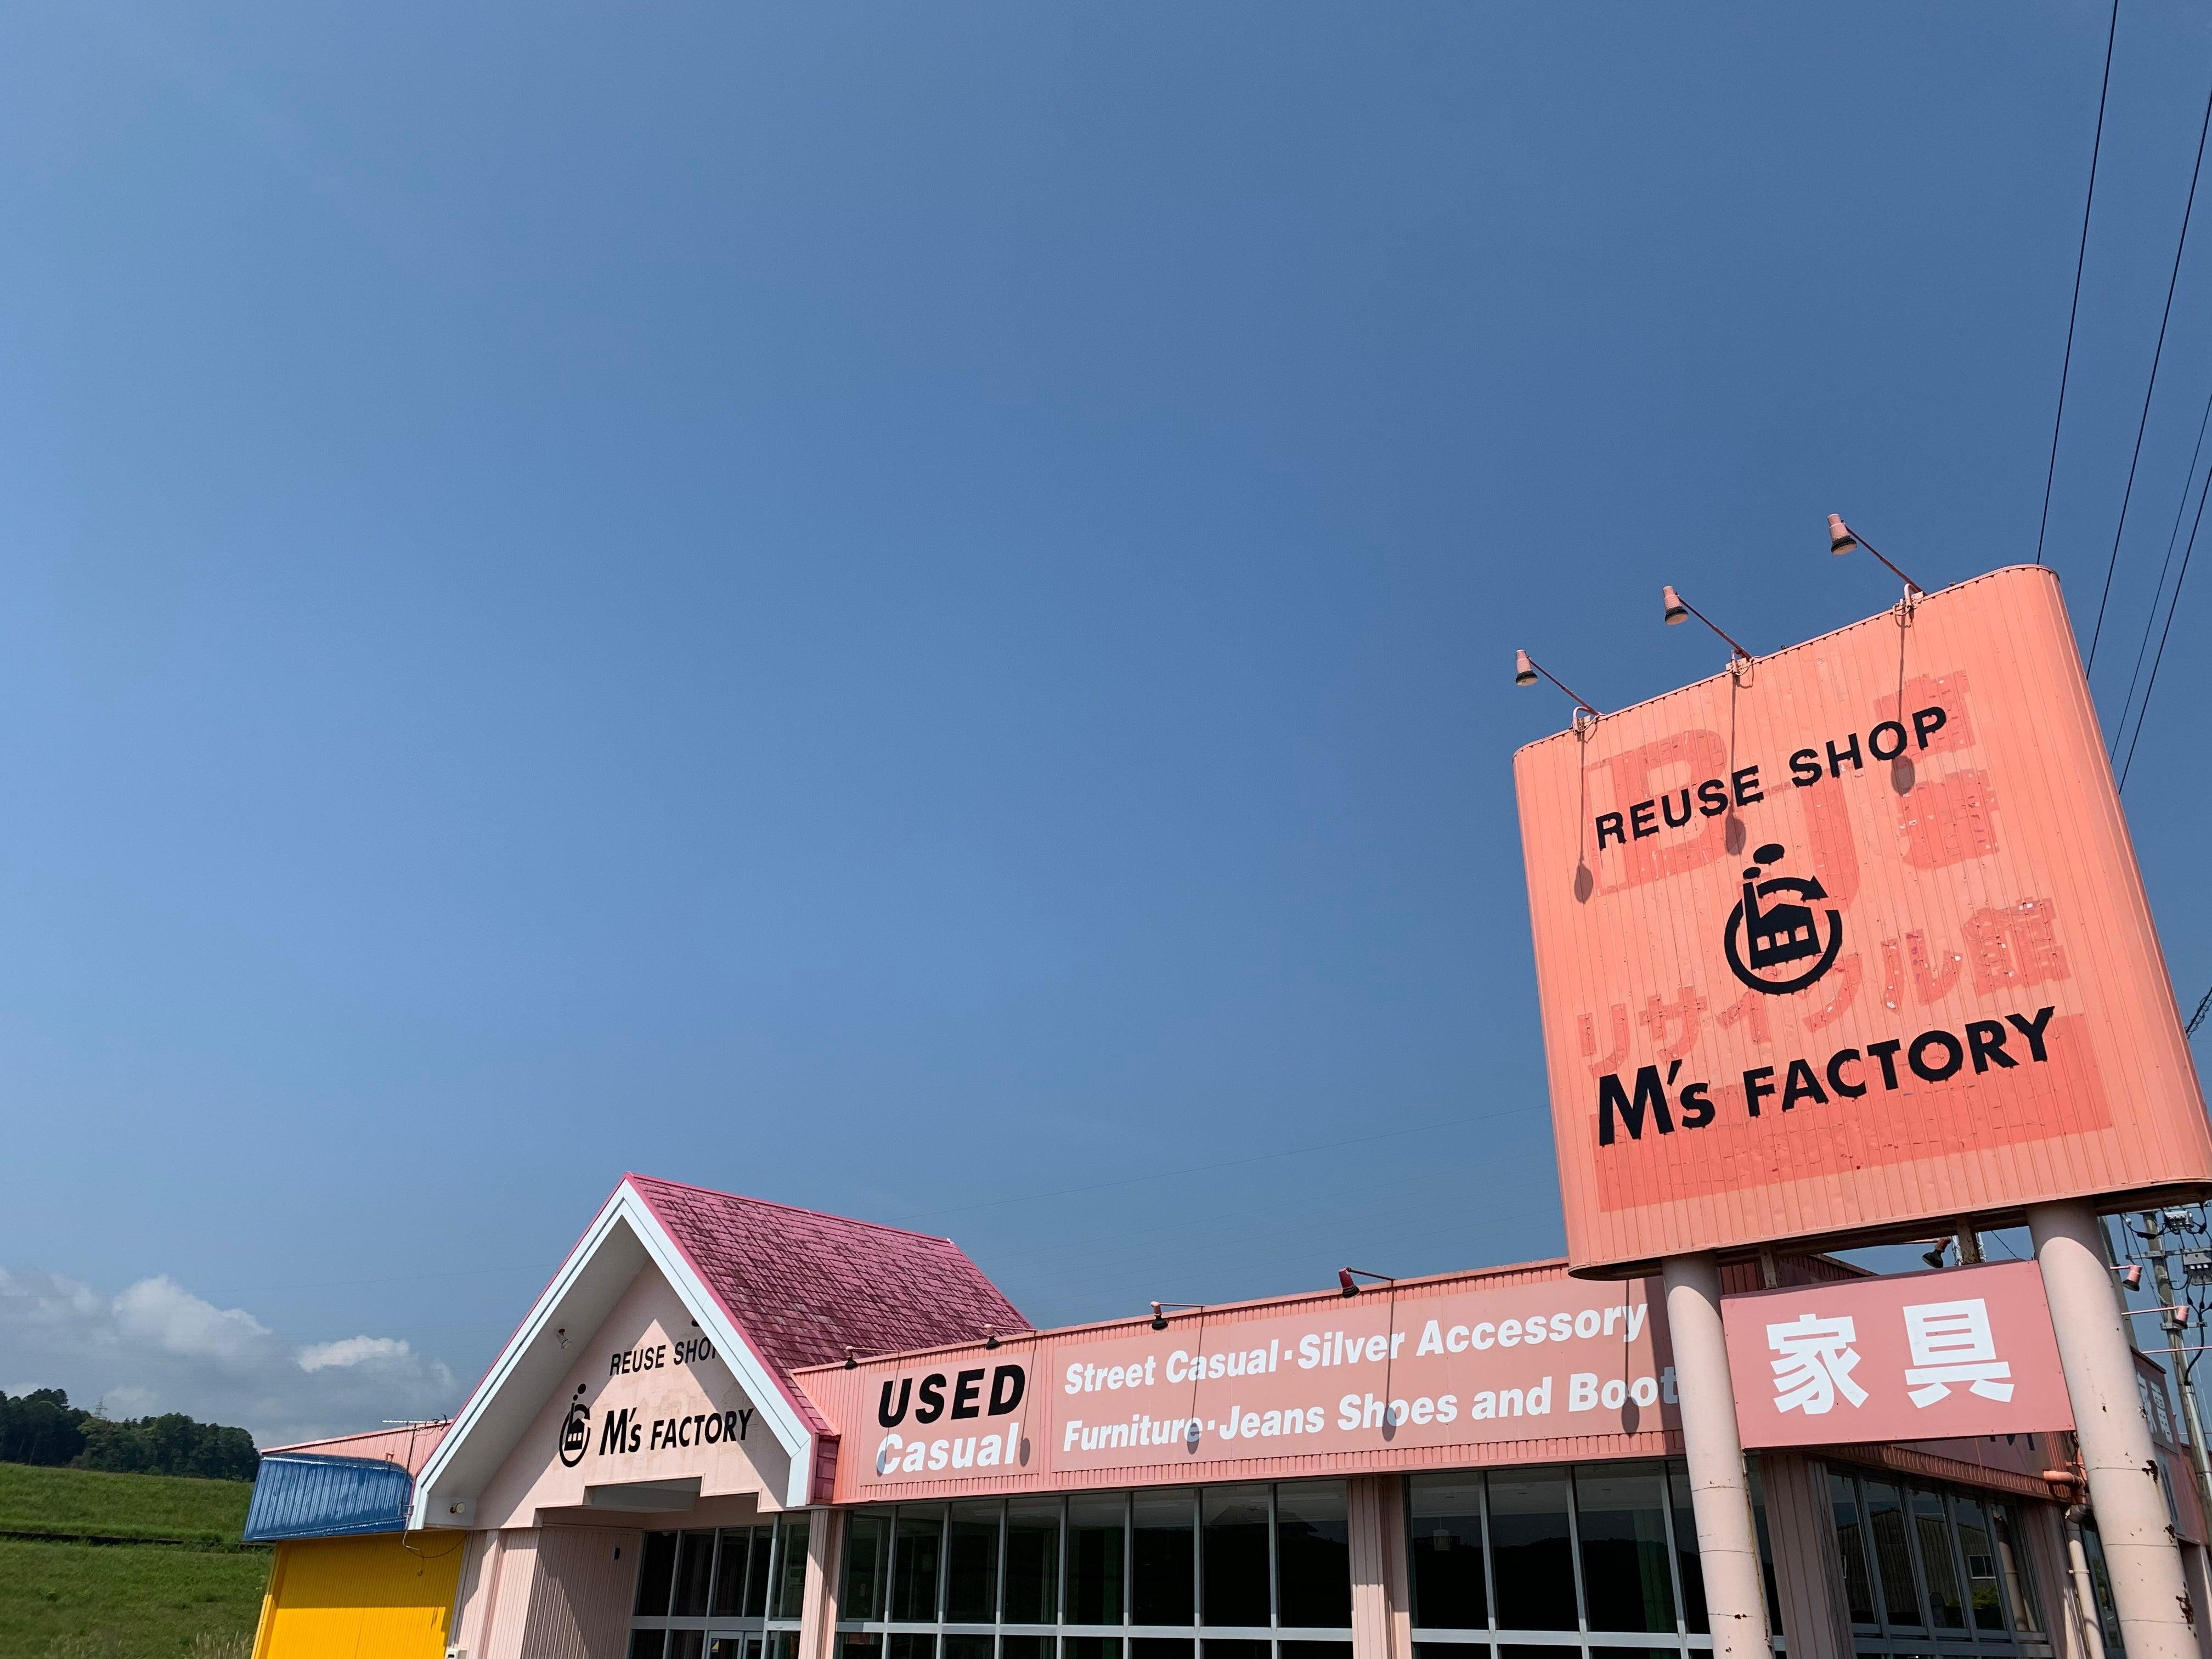 REUSE SHOP. M's FACTORY. . エムズファクトリーは 高知県四万十市において、中古品買取と販売を行う 総合リユースショップ(リサイクルショップ)です。 衣料品・服飾品を中心に、家具家電、釣具など 幅広…